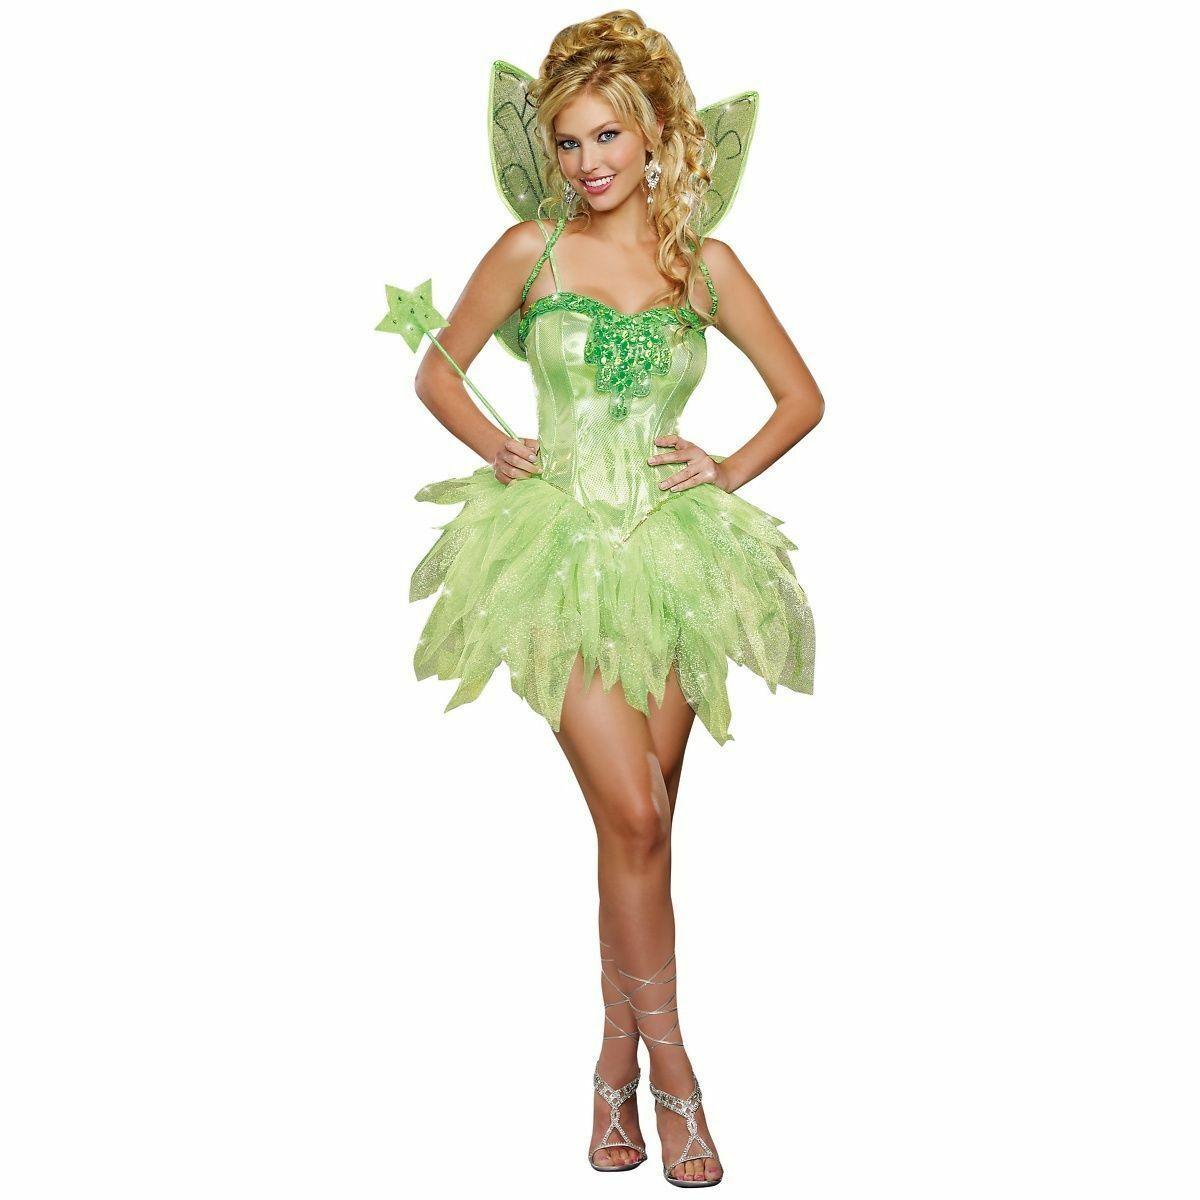 Dreamgirl Fairy-Licious Tinkerbell Fantasie Funkelt Erwachsene Damen Kostüm 9452